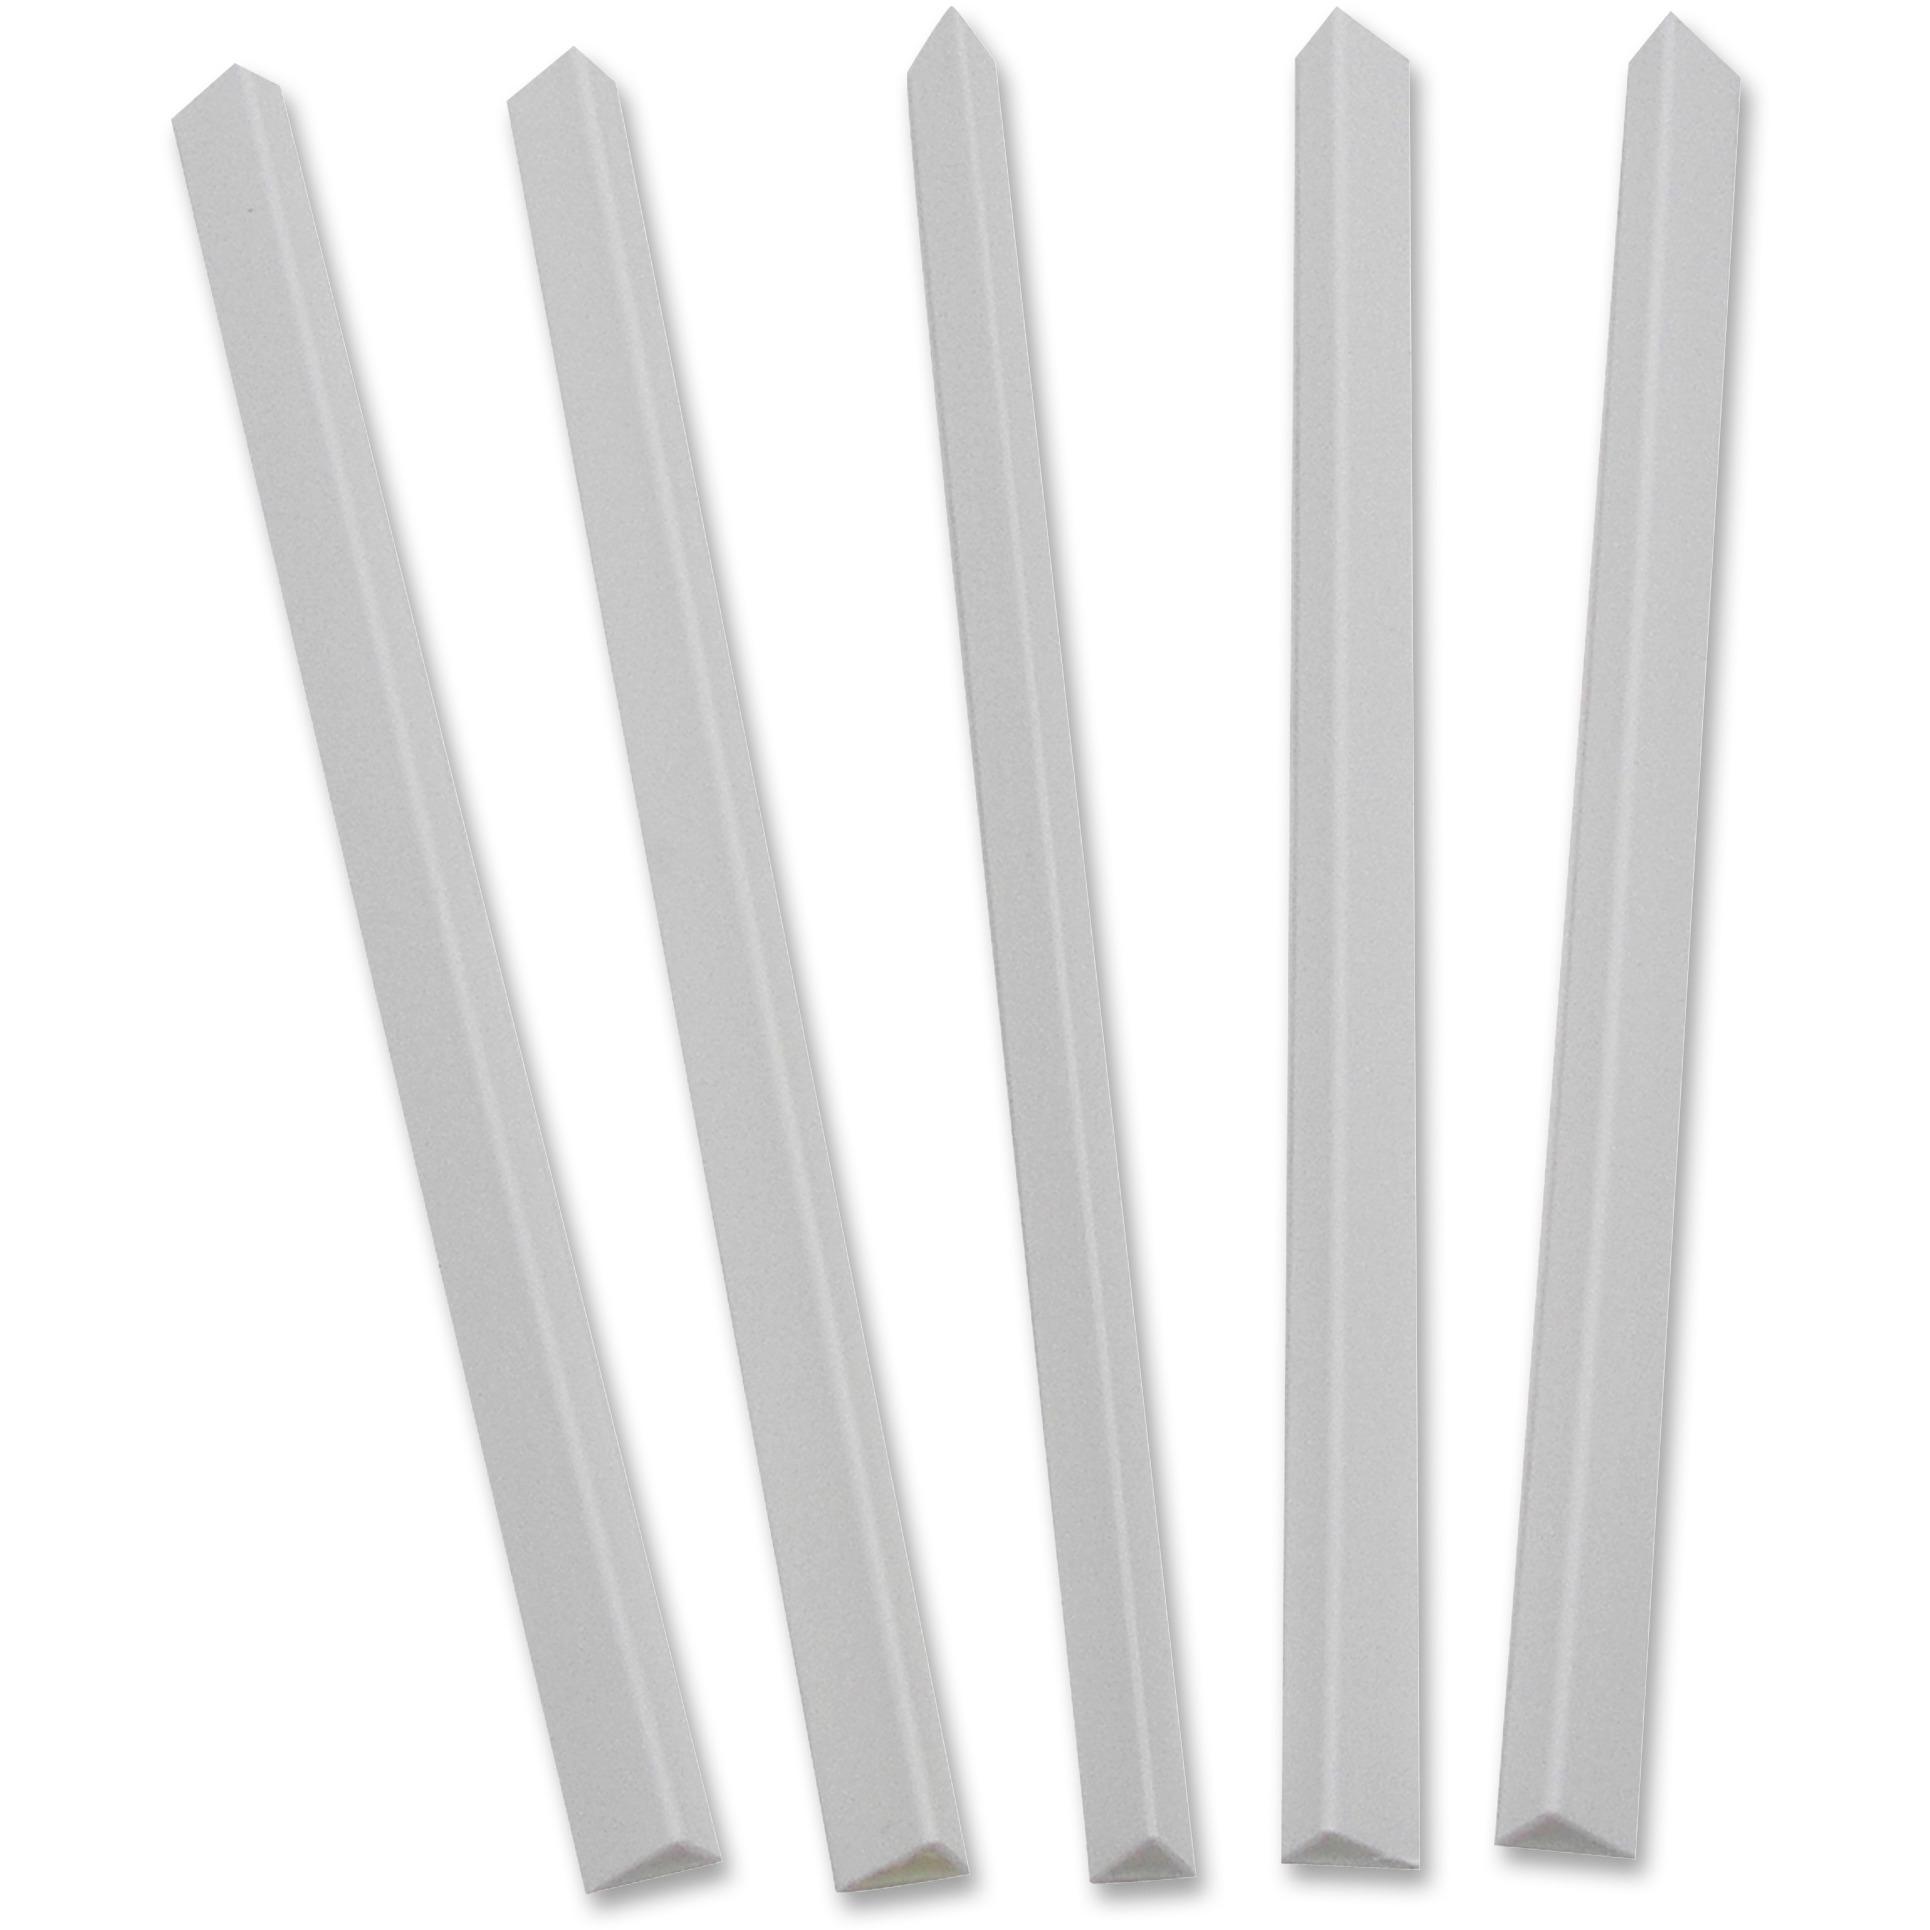 Slide 'N Grip Binding Bars, White, 11 x 1/2, 100/Box